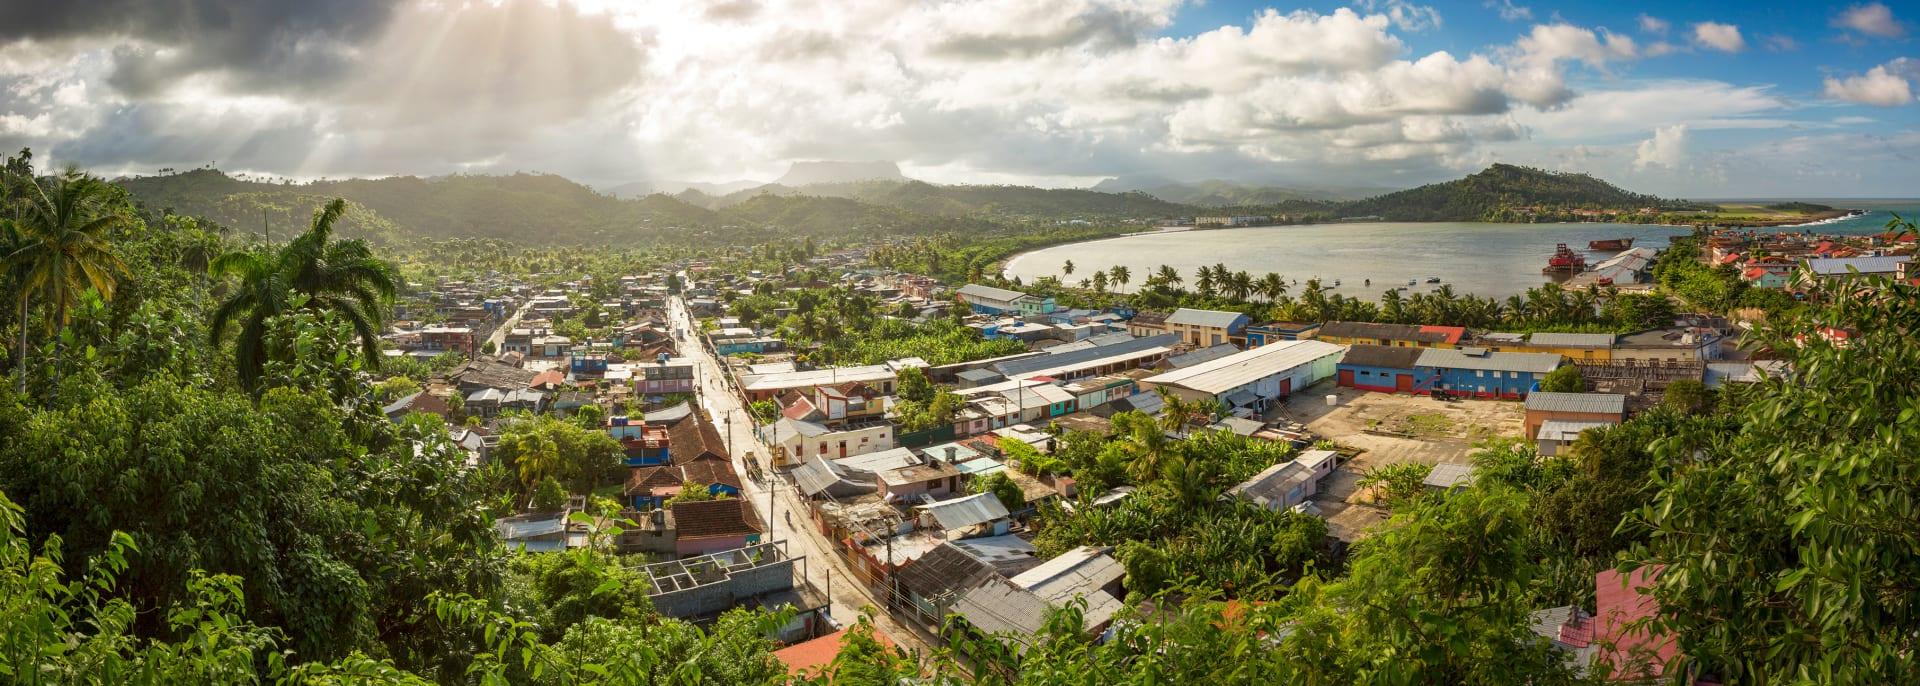 Panoramic view of Baracoa and El Yunque , Cuba